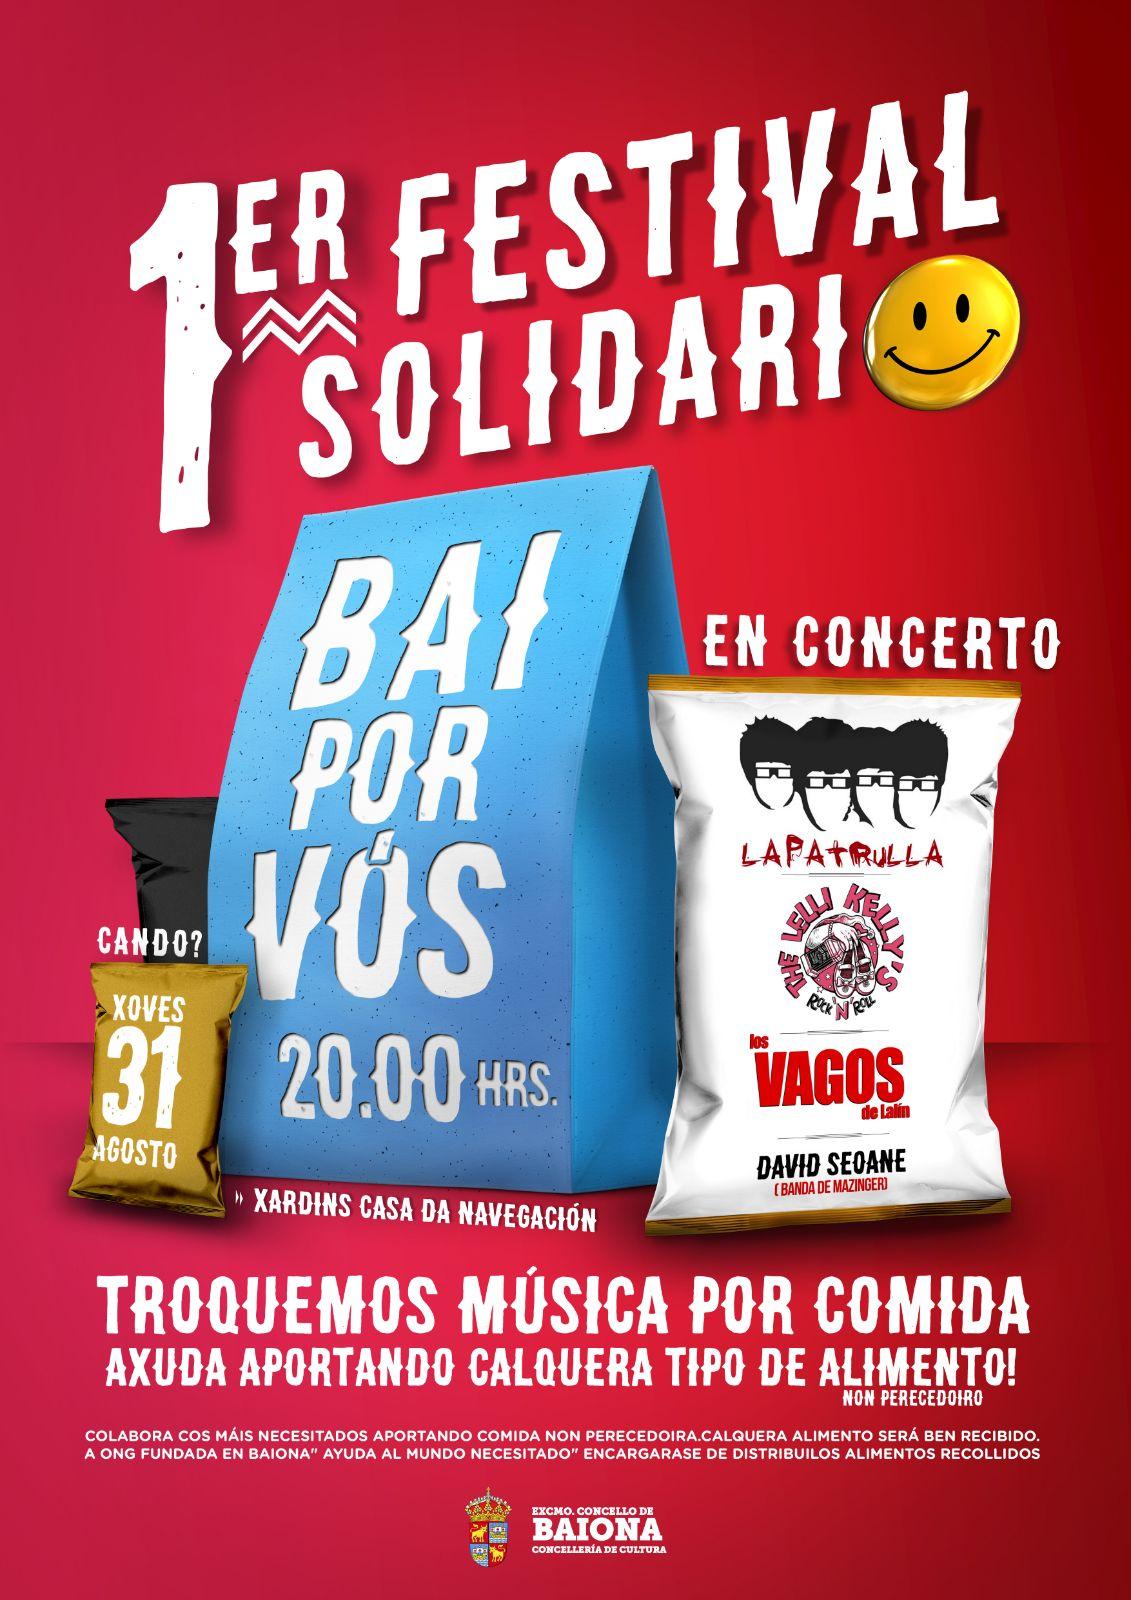 2017-08-23 – Festival Solidario Bai por Vós